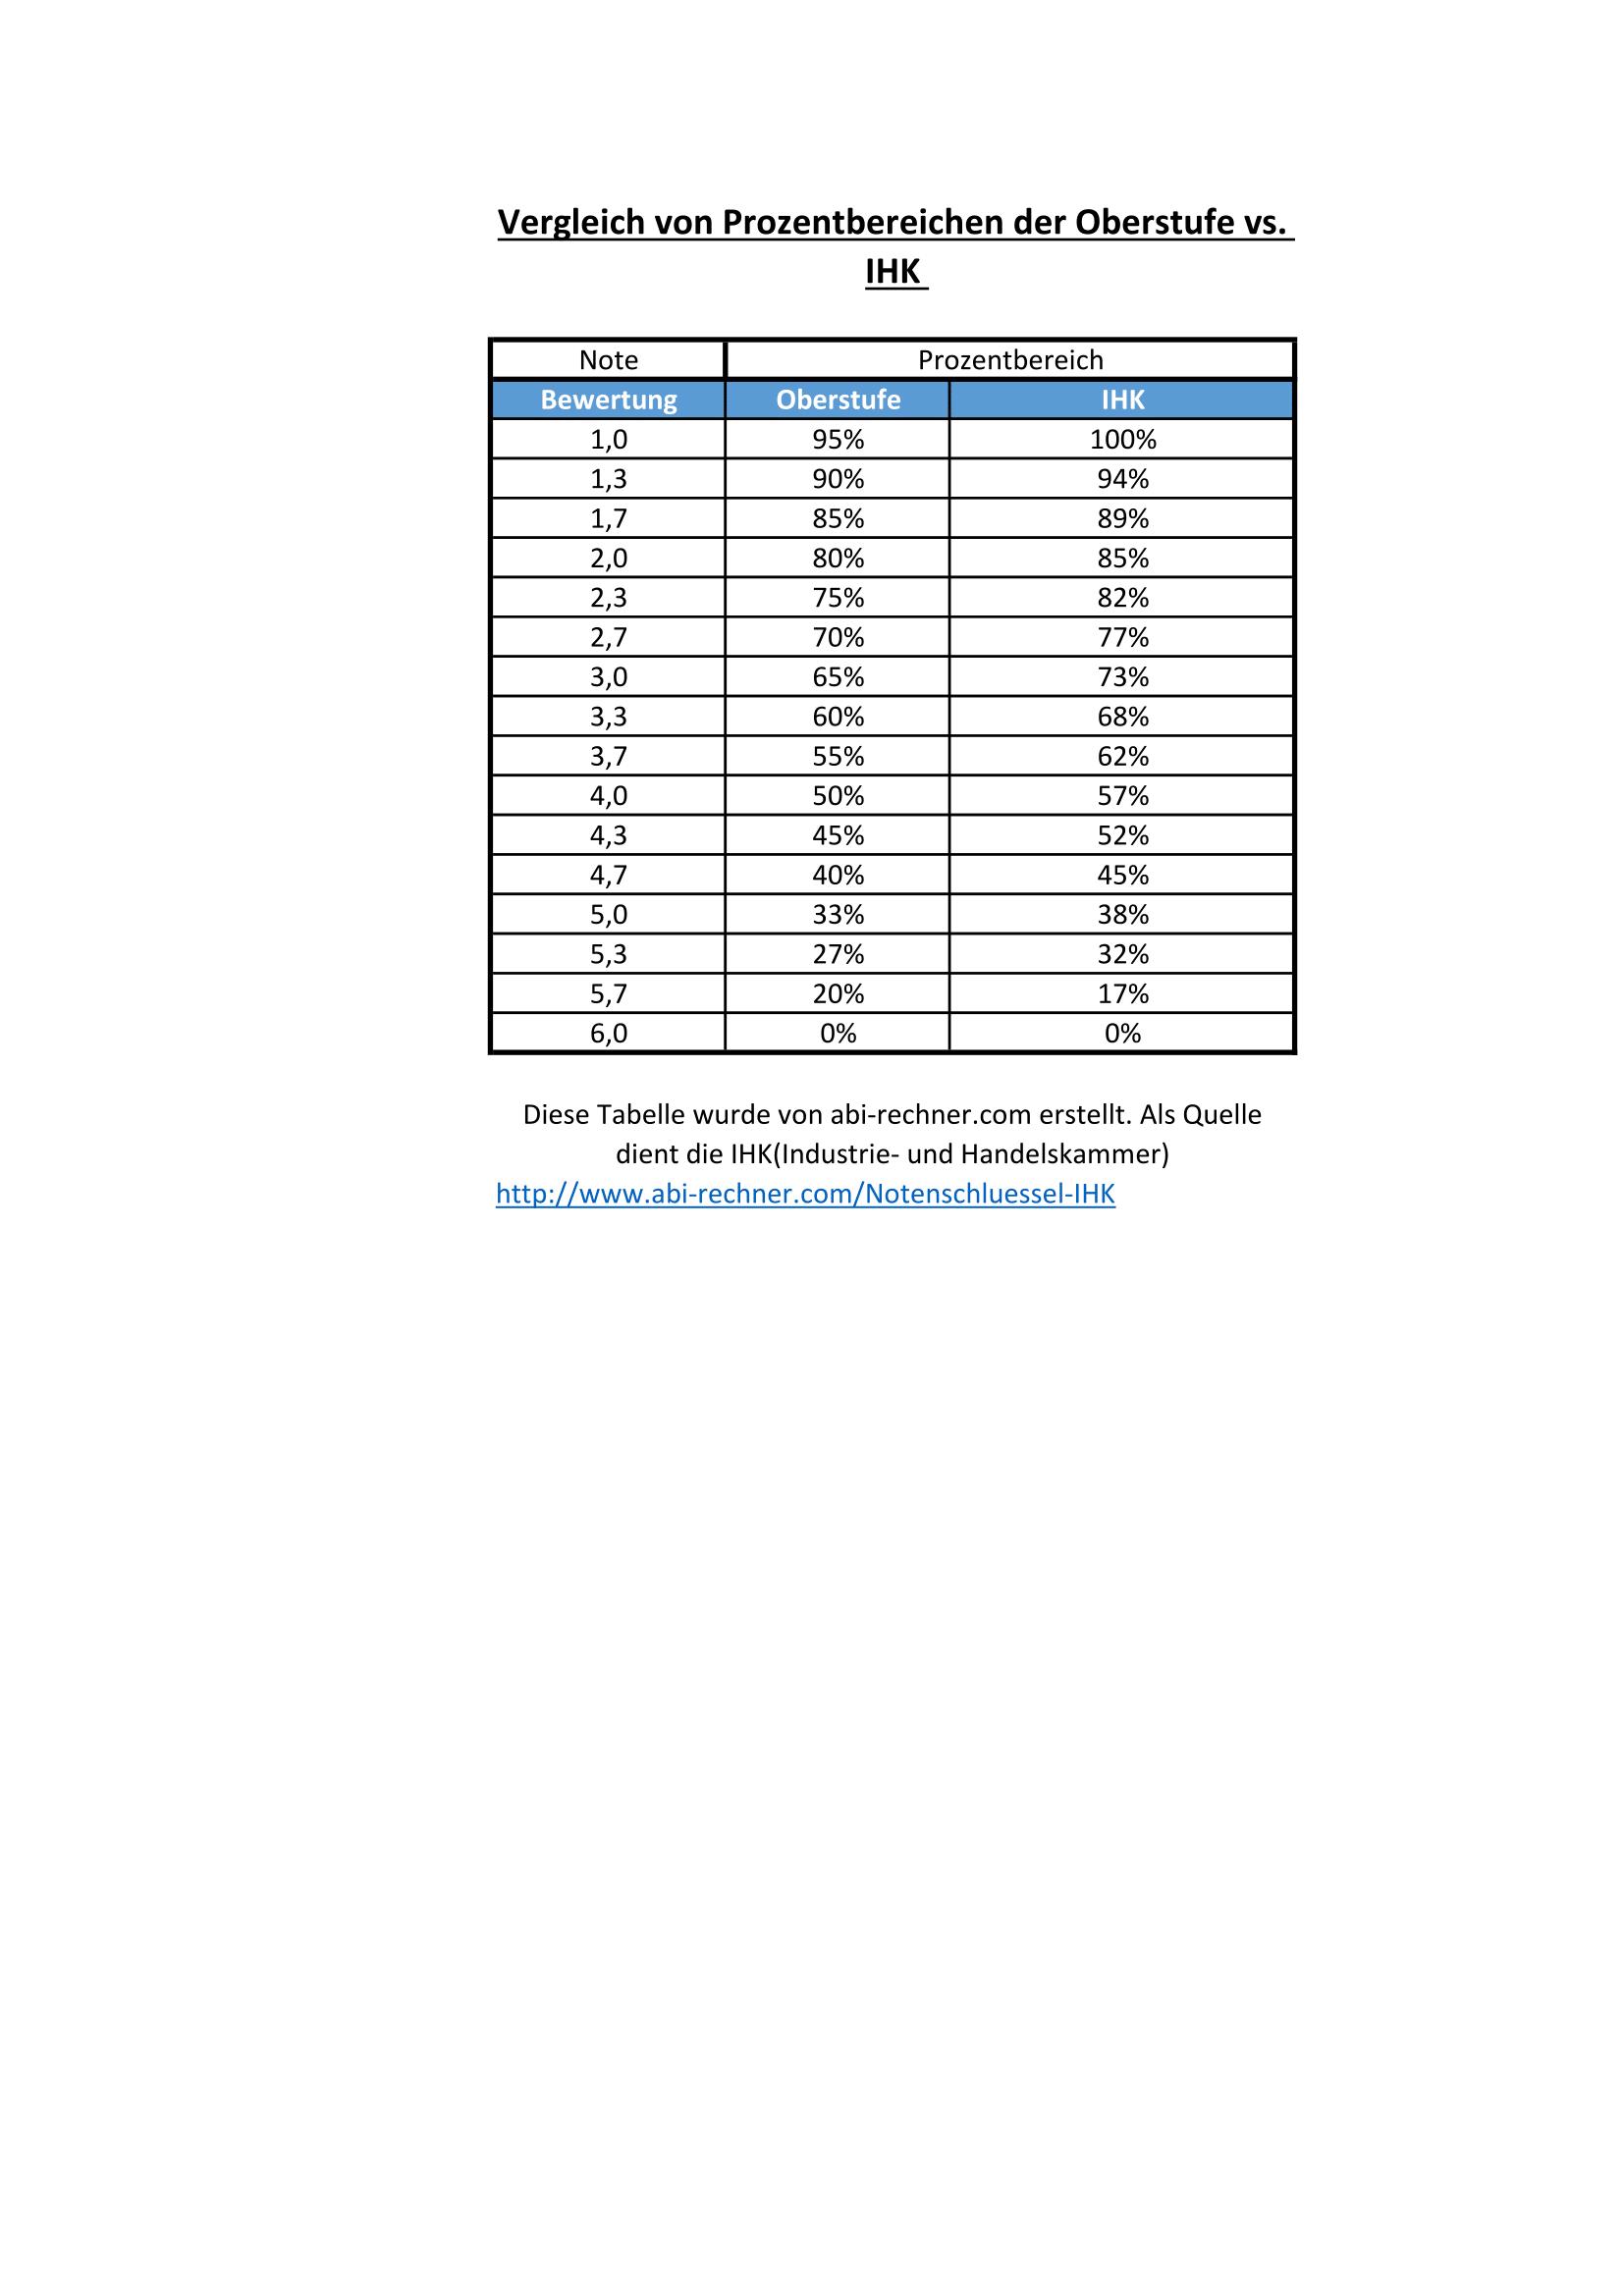 Notenschl ssel der ihk infos download als excel png for Tabelle punkte noten